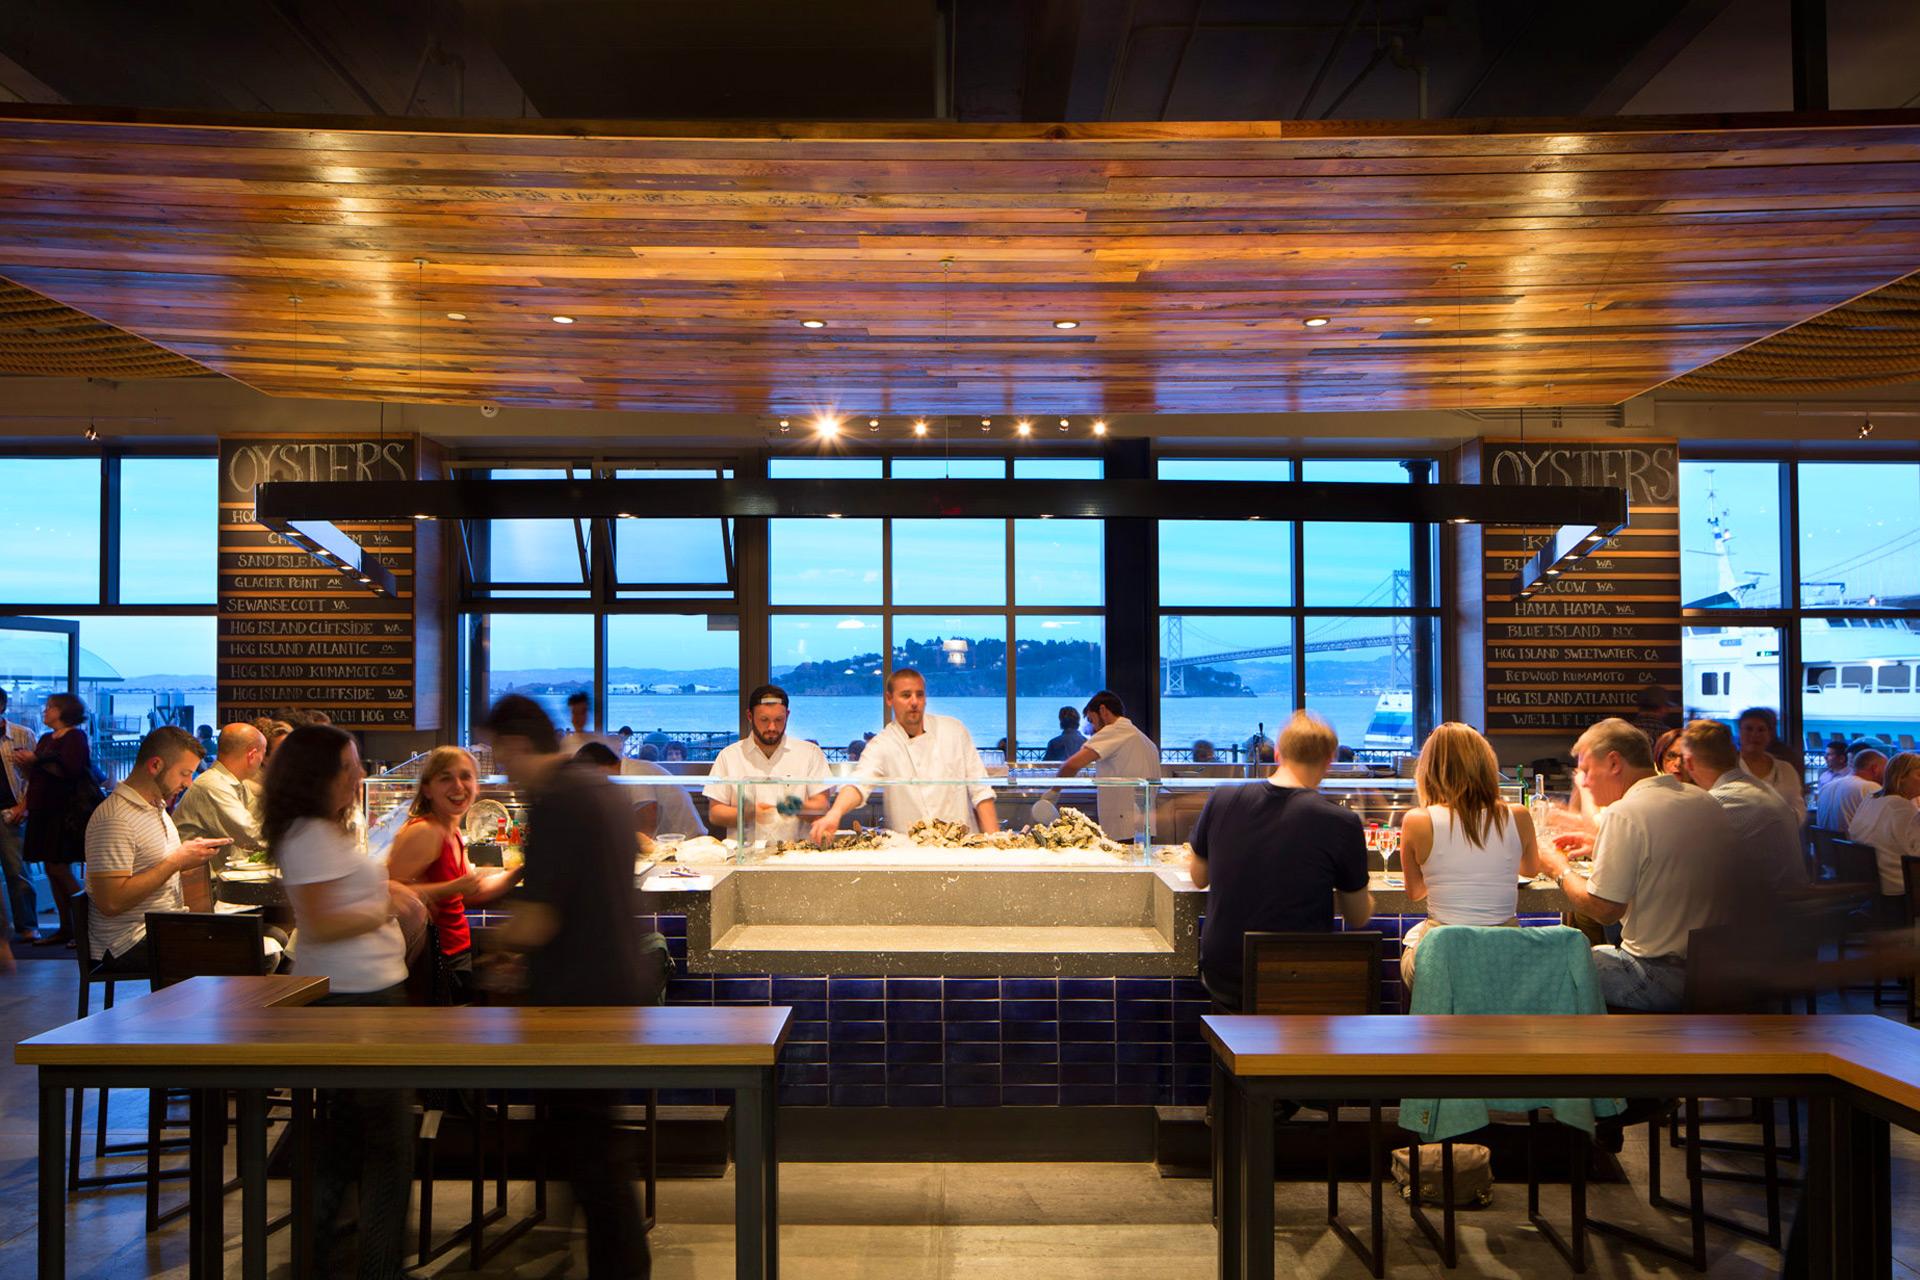 Hog Island Oyster Co. restaurant interiors